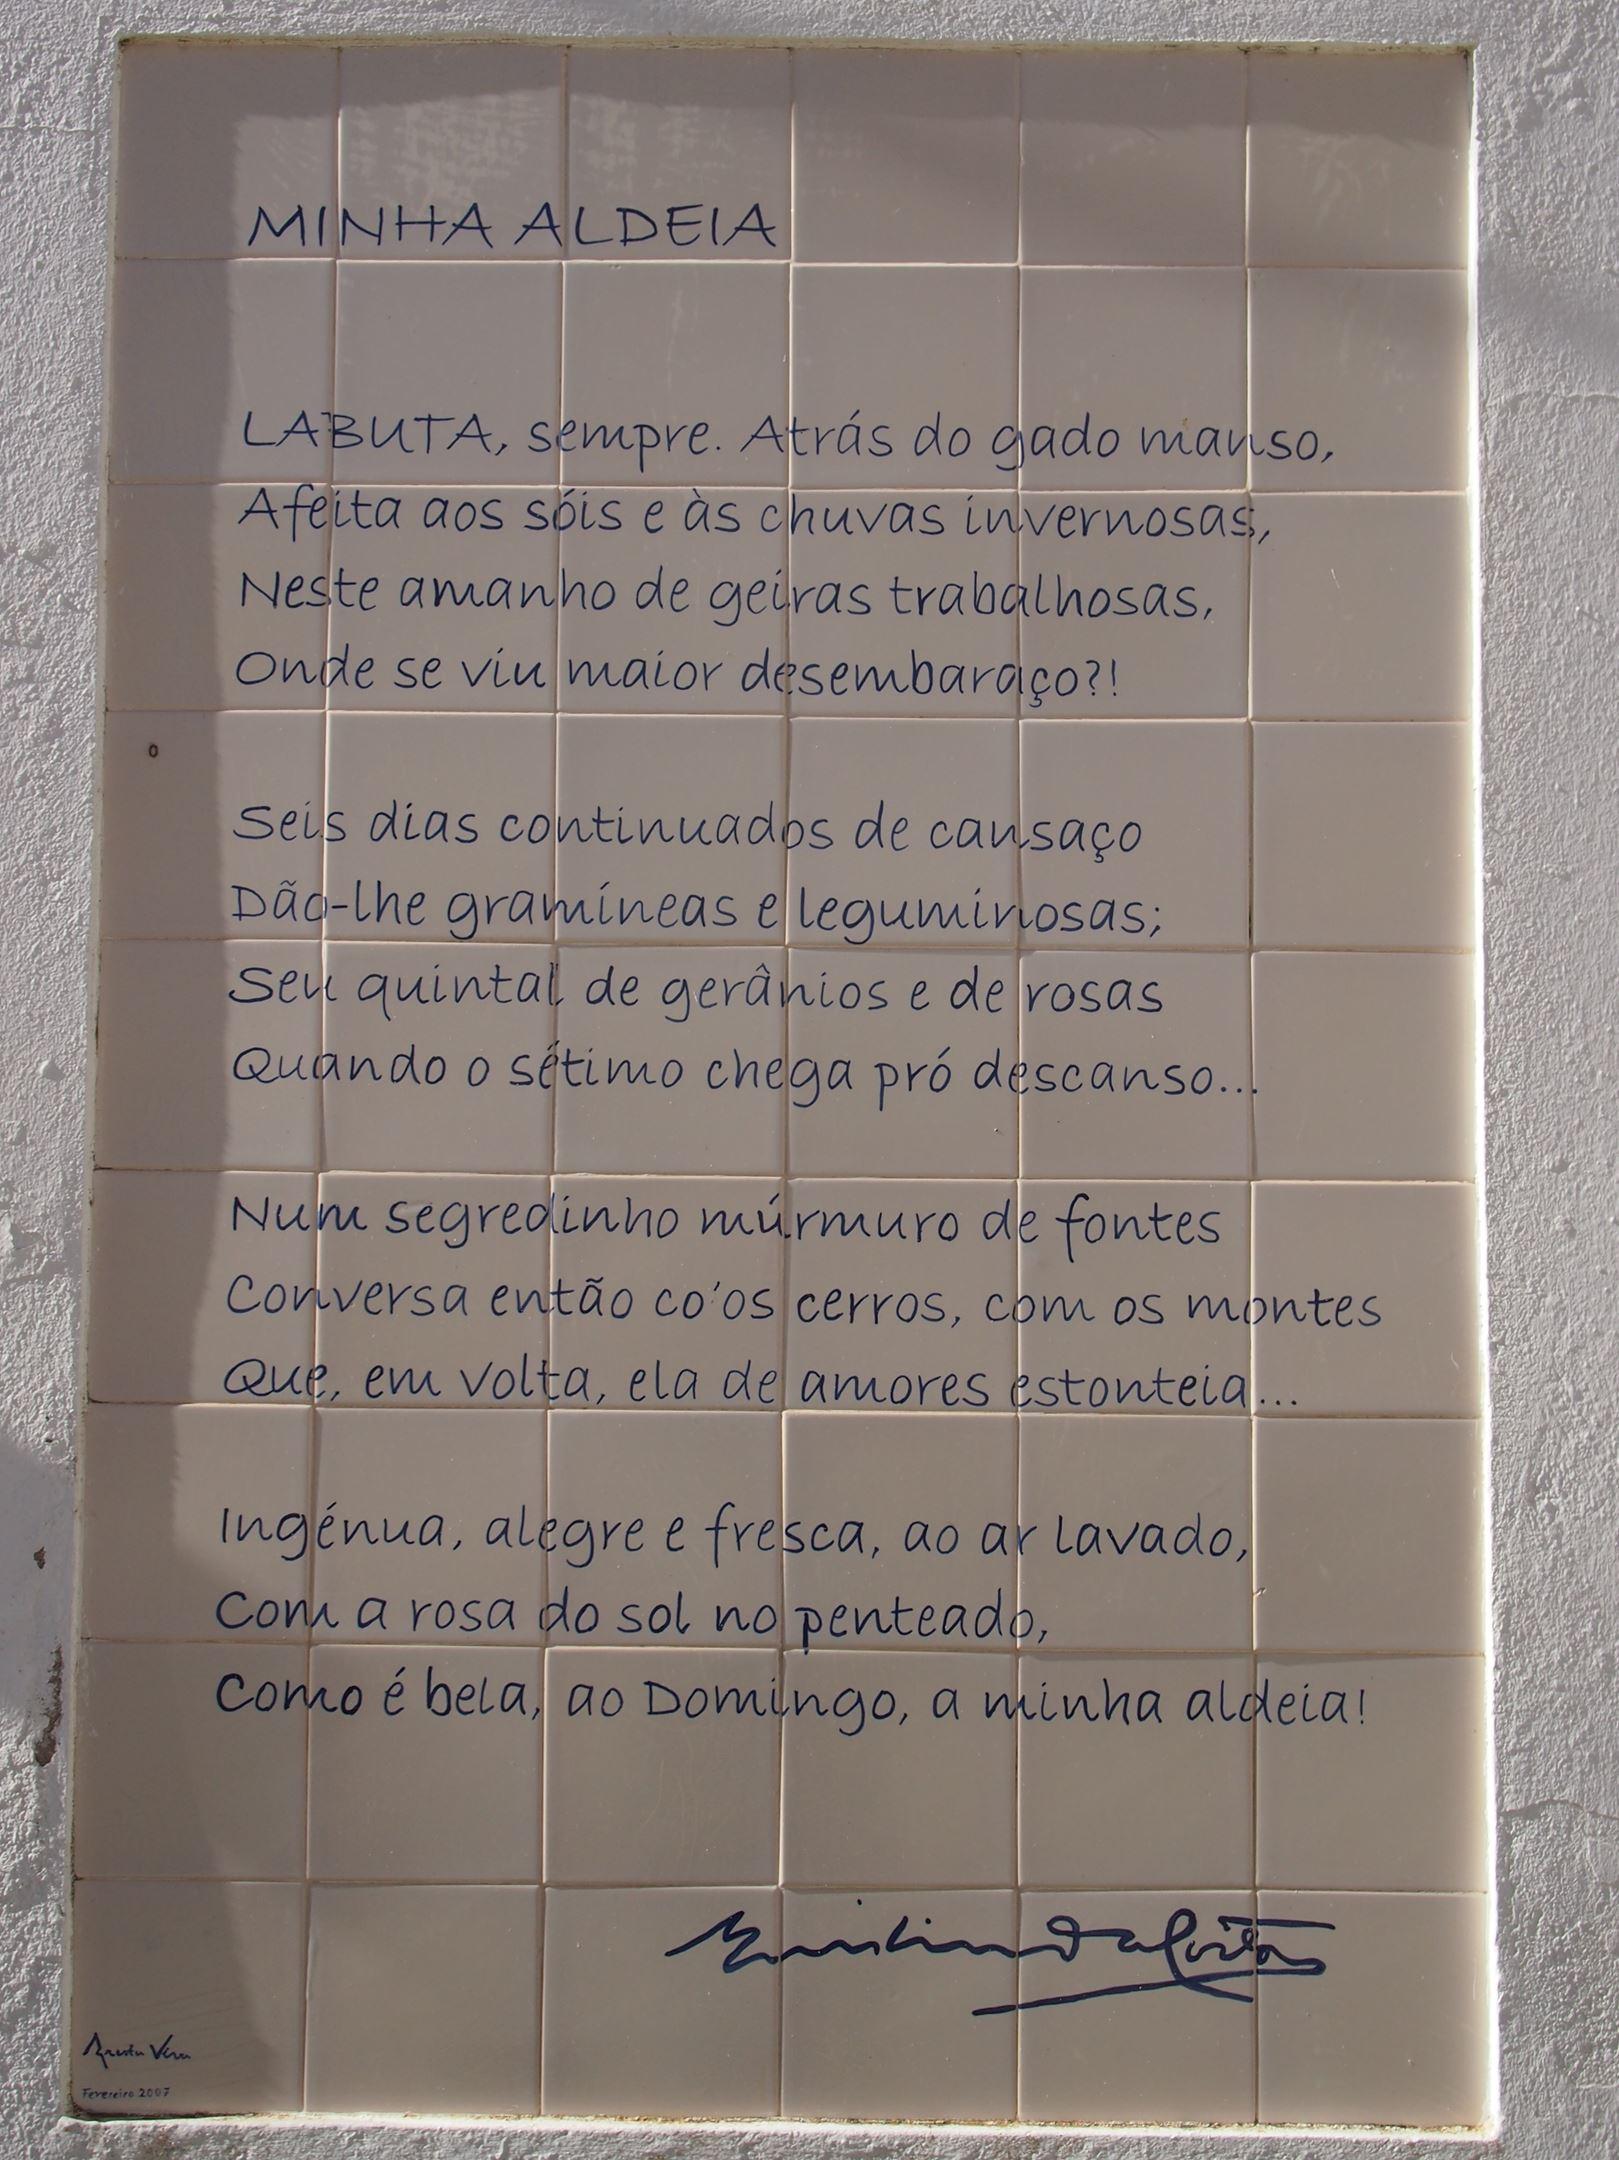 Poesia de Estoi. Ao caminhar por Estoi,  encontrará poemas colocados aleatoriamente, tal como a